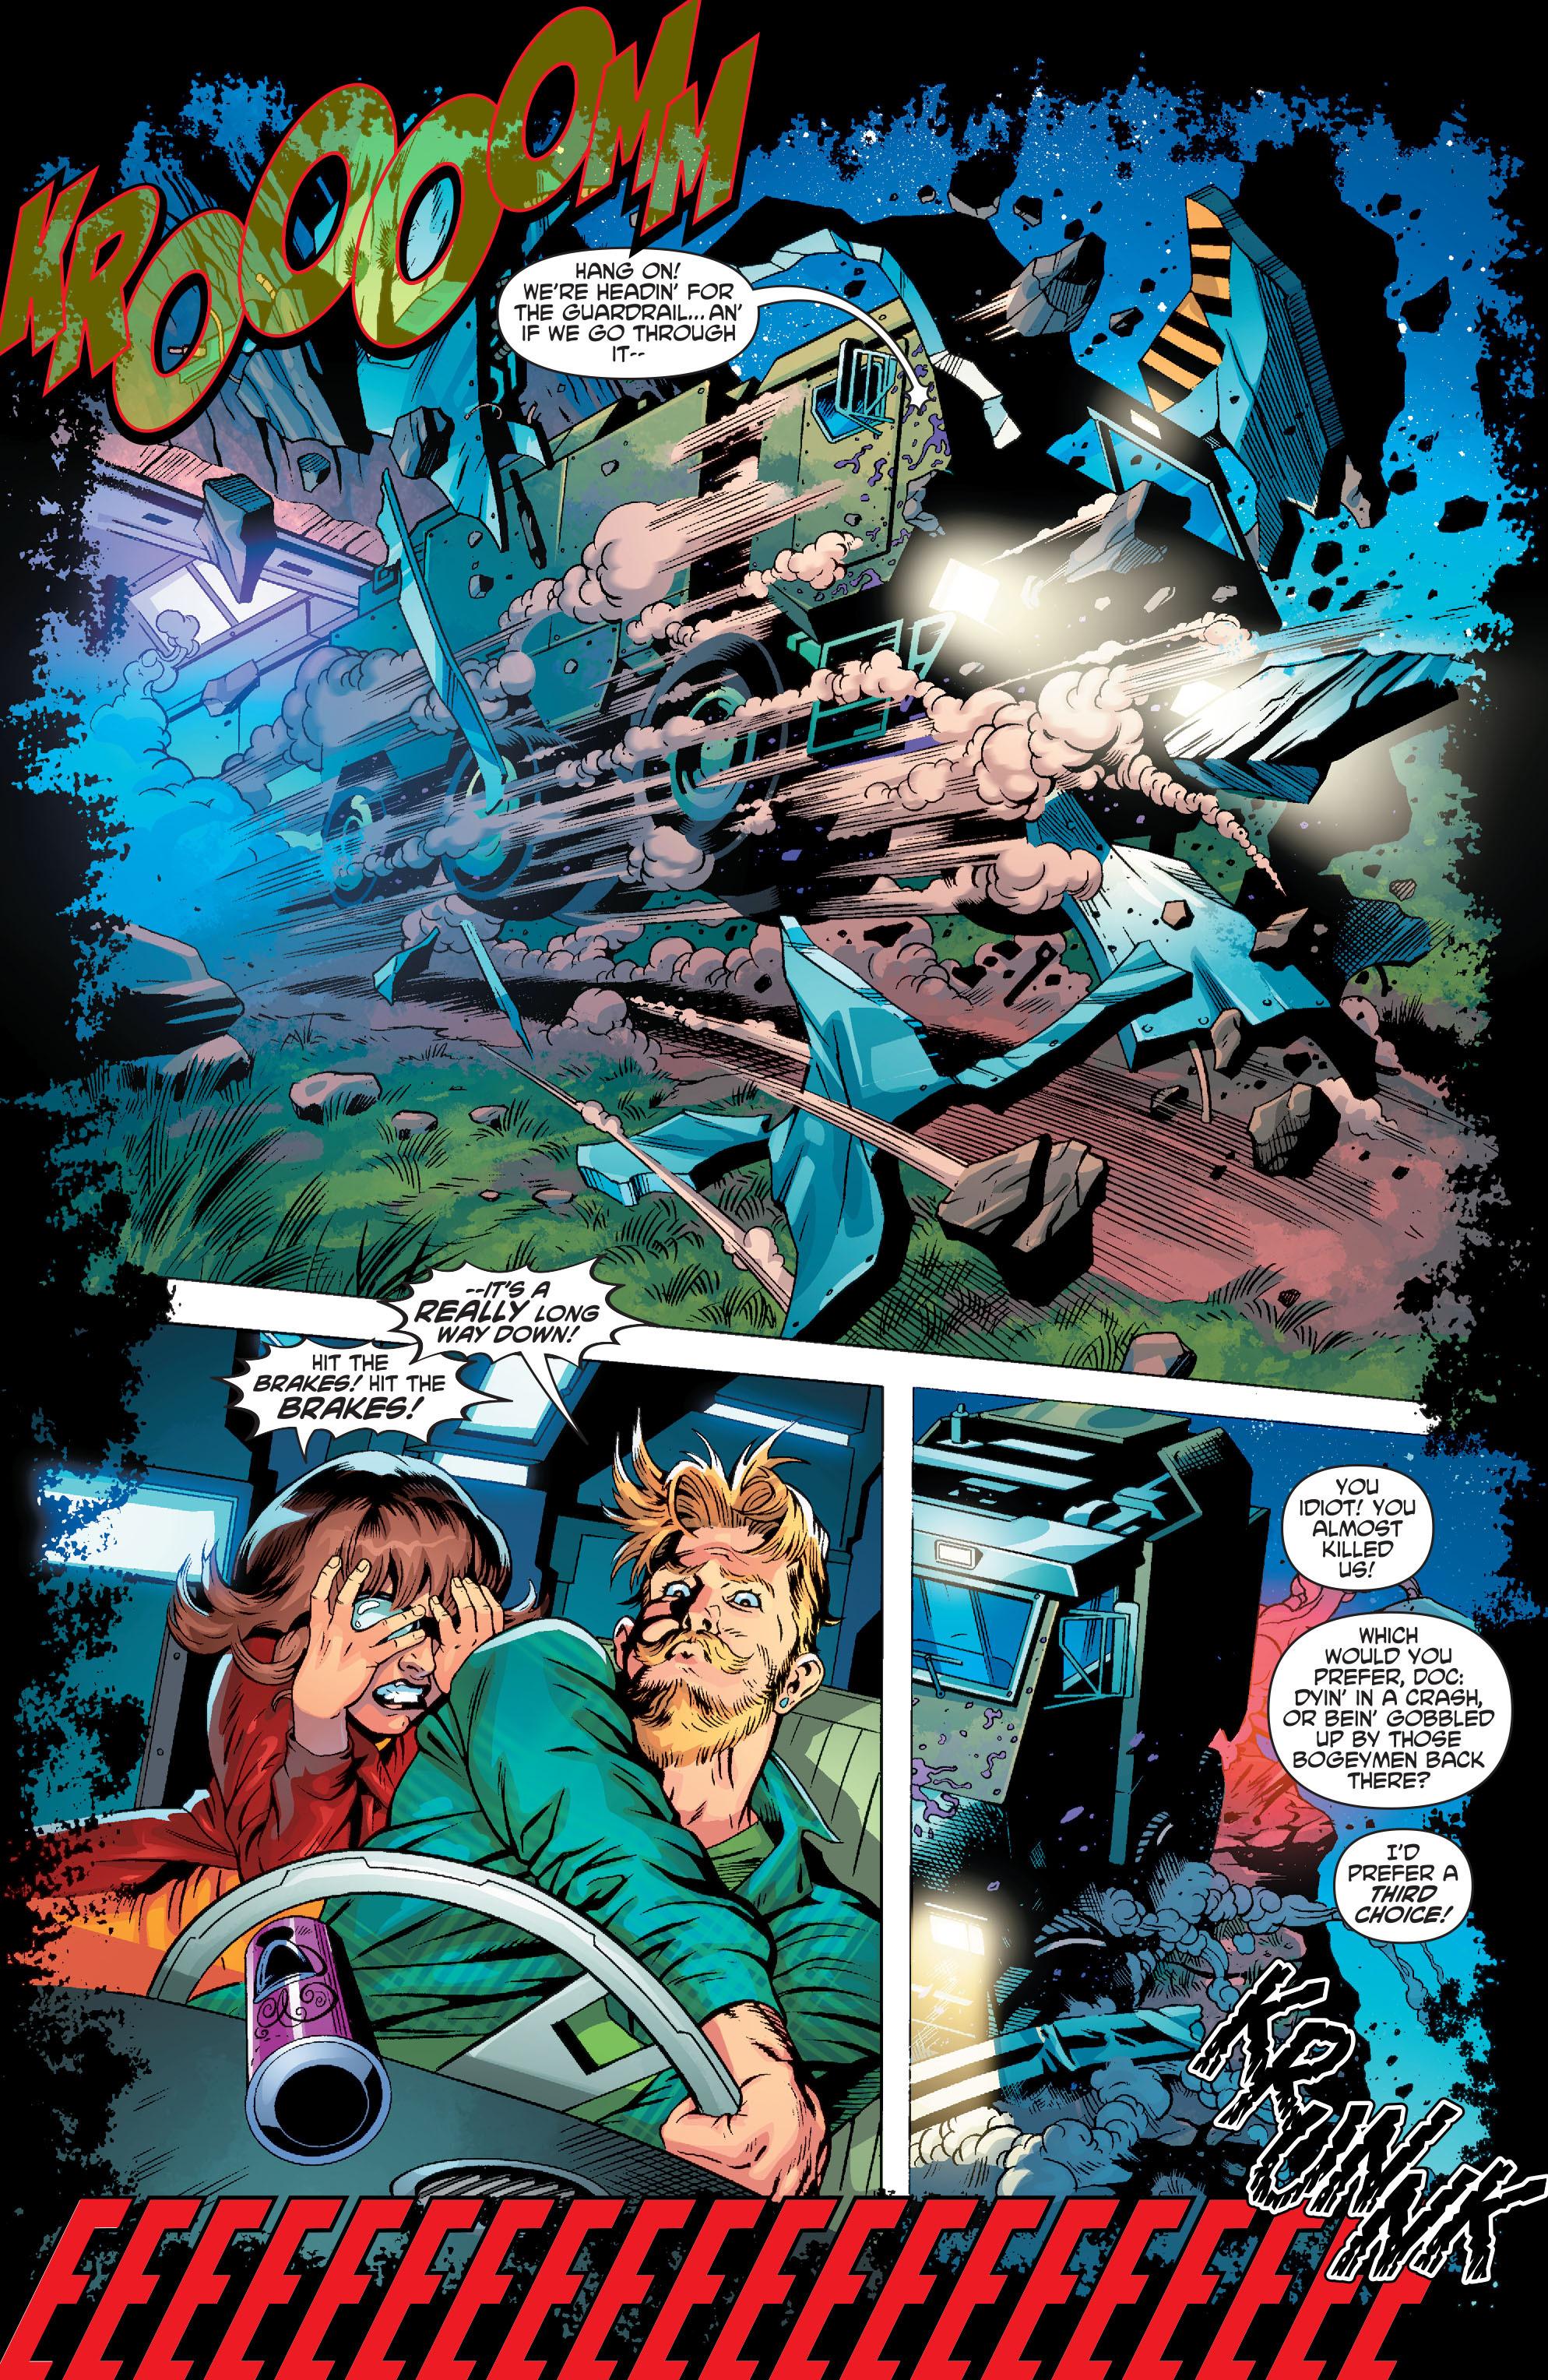 Read online Scooby Apocalypse comic -  Issue #3 - 19